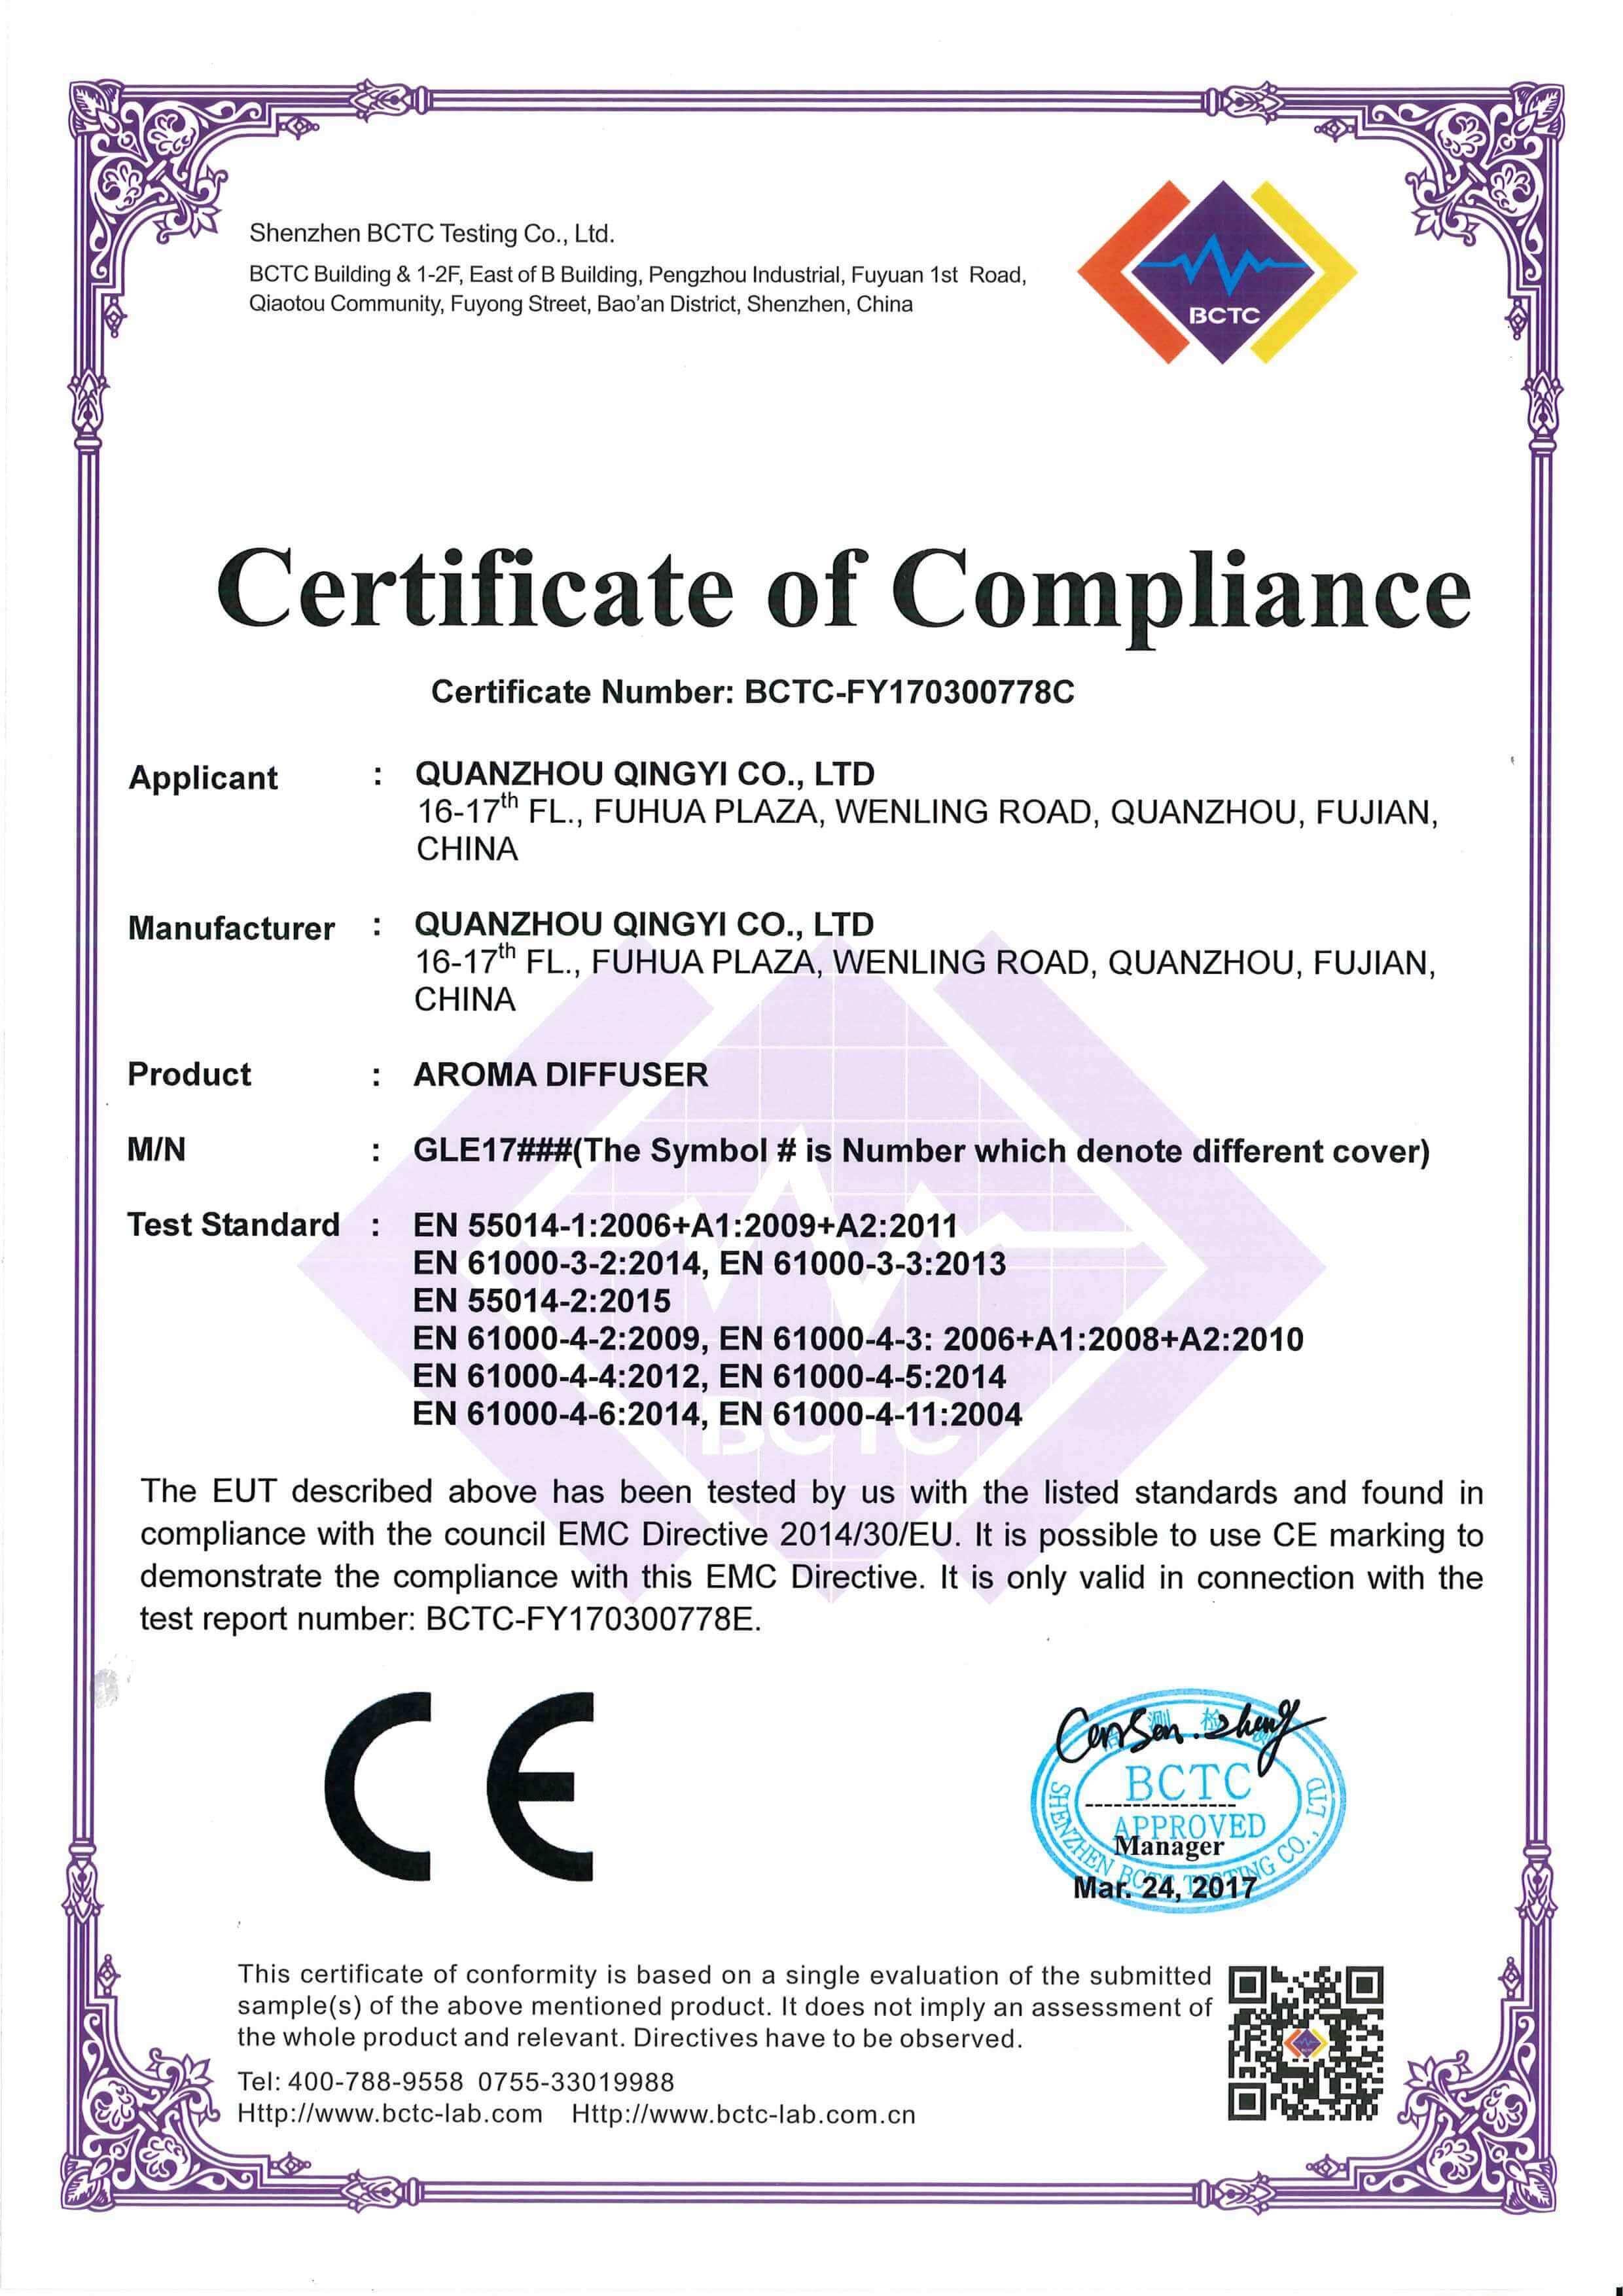 EMC report for Aroma Diffuser